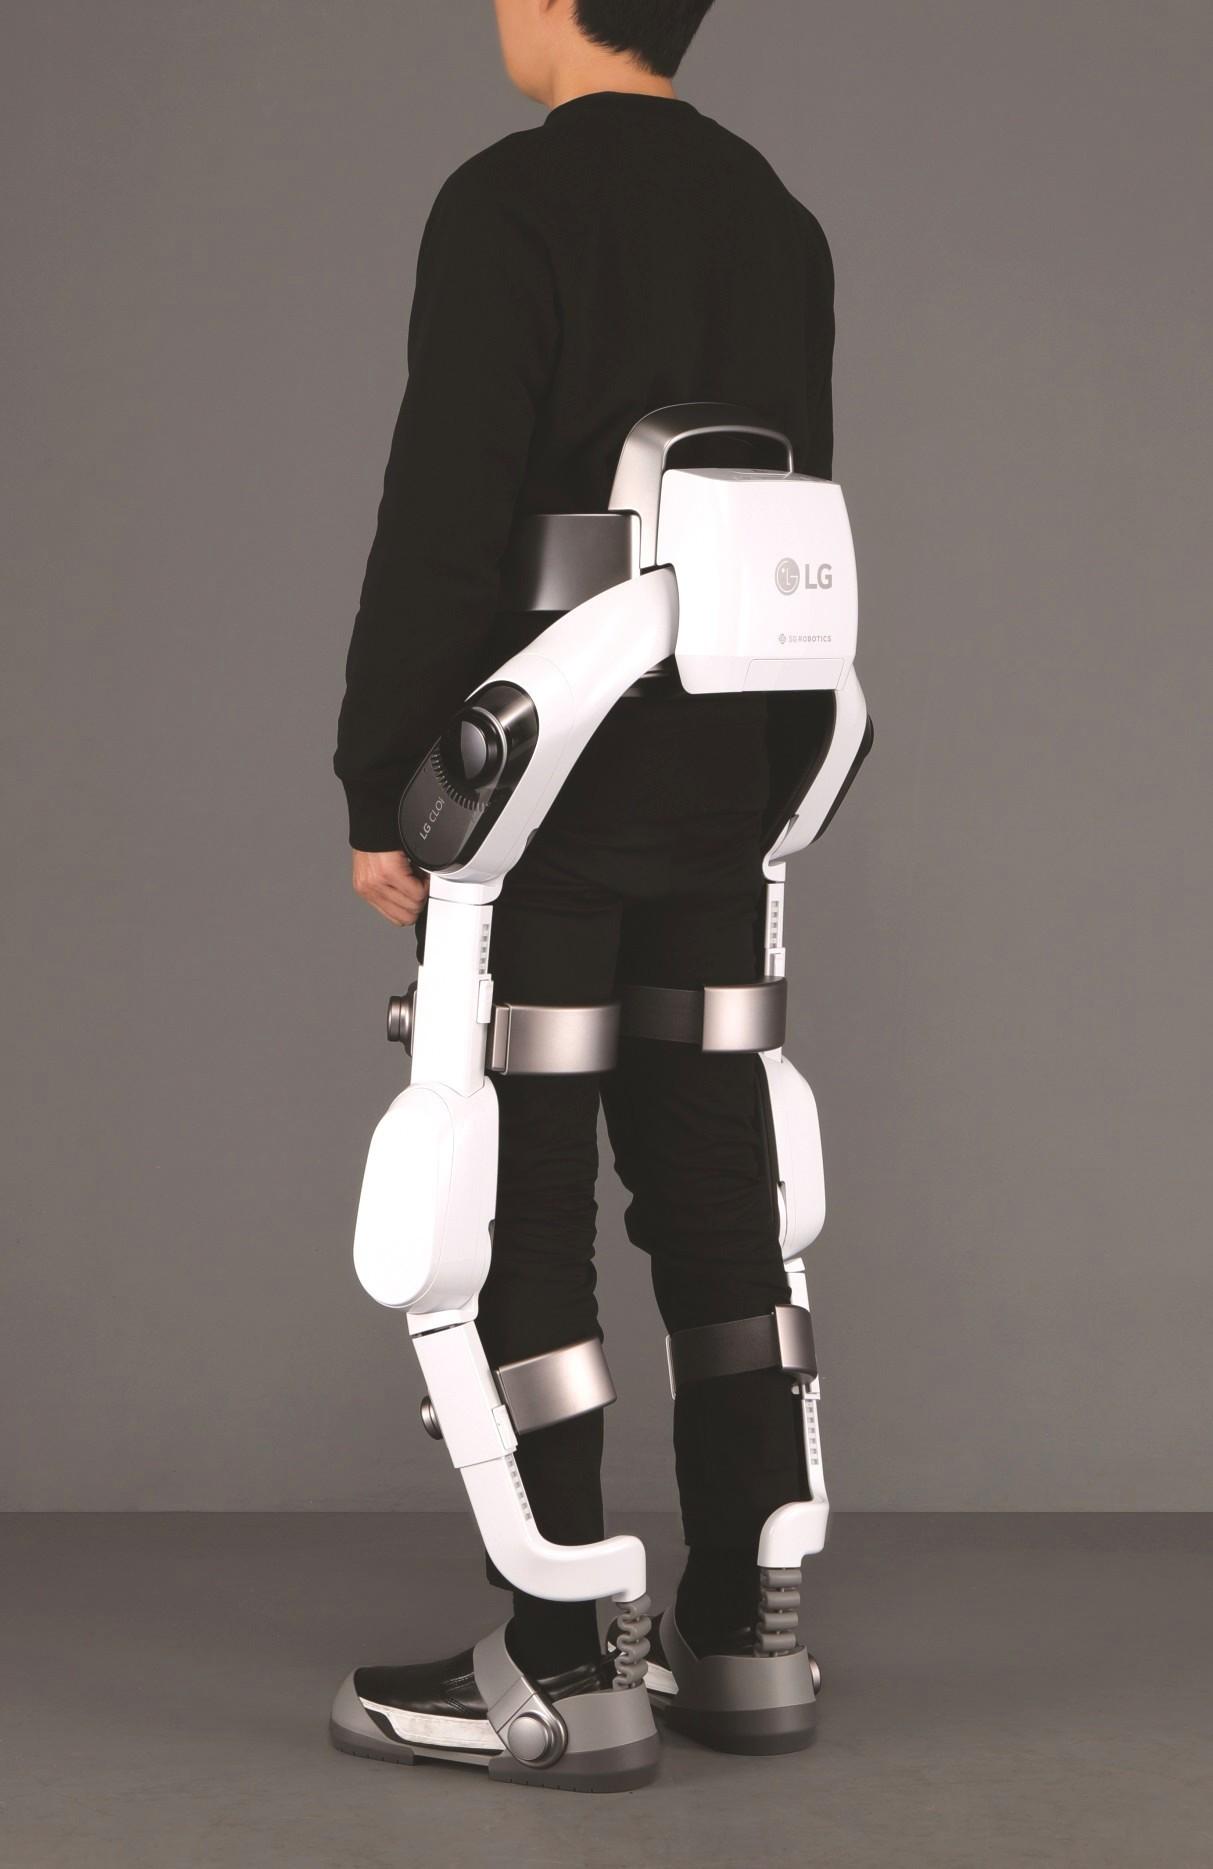 Hyundai_exoskeletons_0002